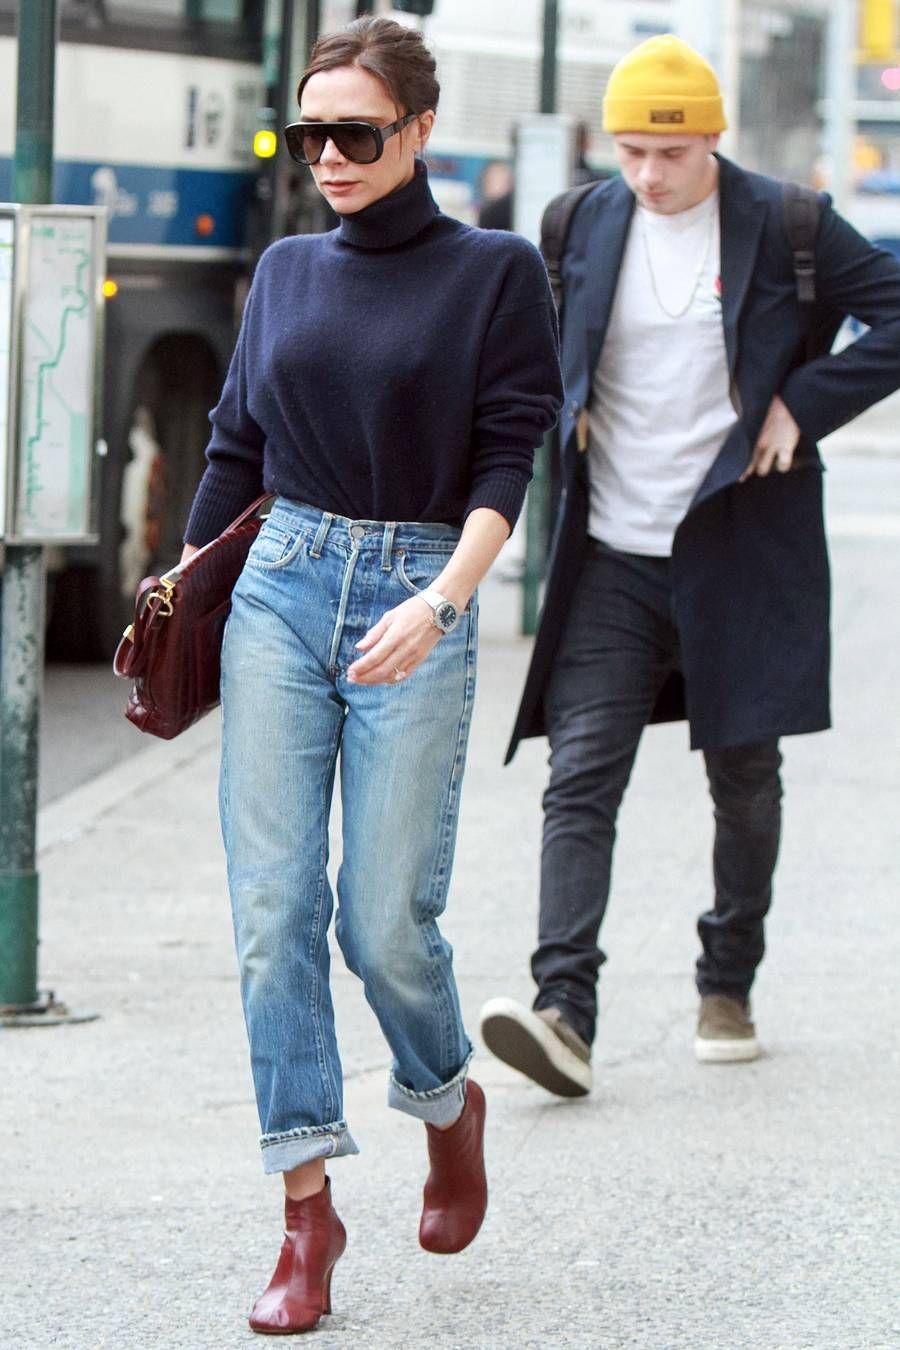 The Coolest Ways to Wear Boyfriend Jeans Now | Boyfriend jeans style,  Boyfriend jeans, Loose fit jeans